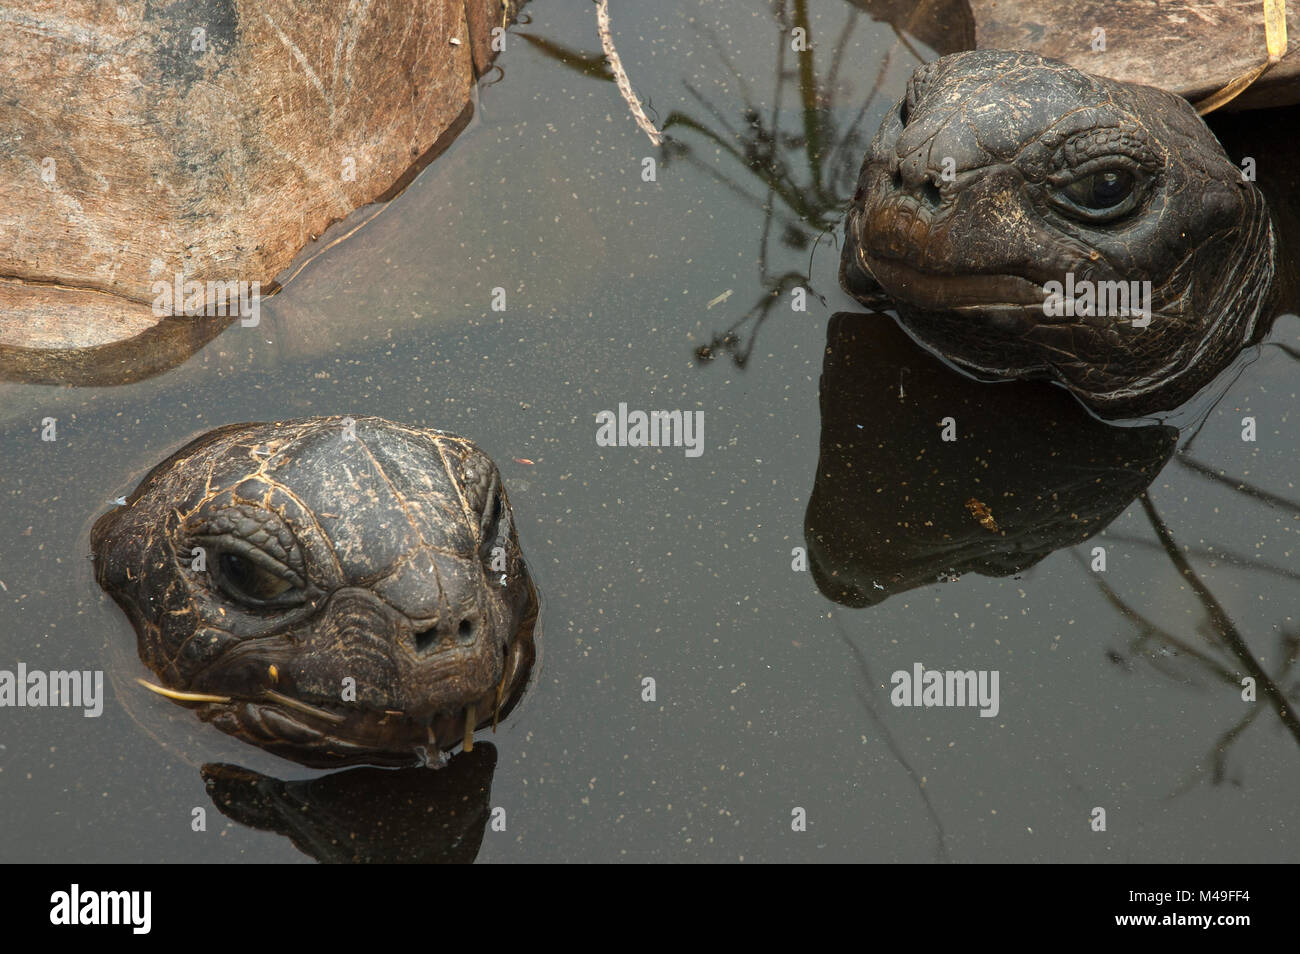 Aldabra Giant Tortoises (Aldabrachelys gigantea) resting in a pool to keep cool, Grand Terre, Natural World Heritage - Stock Image